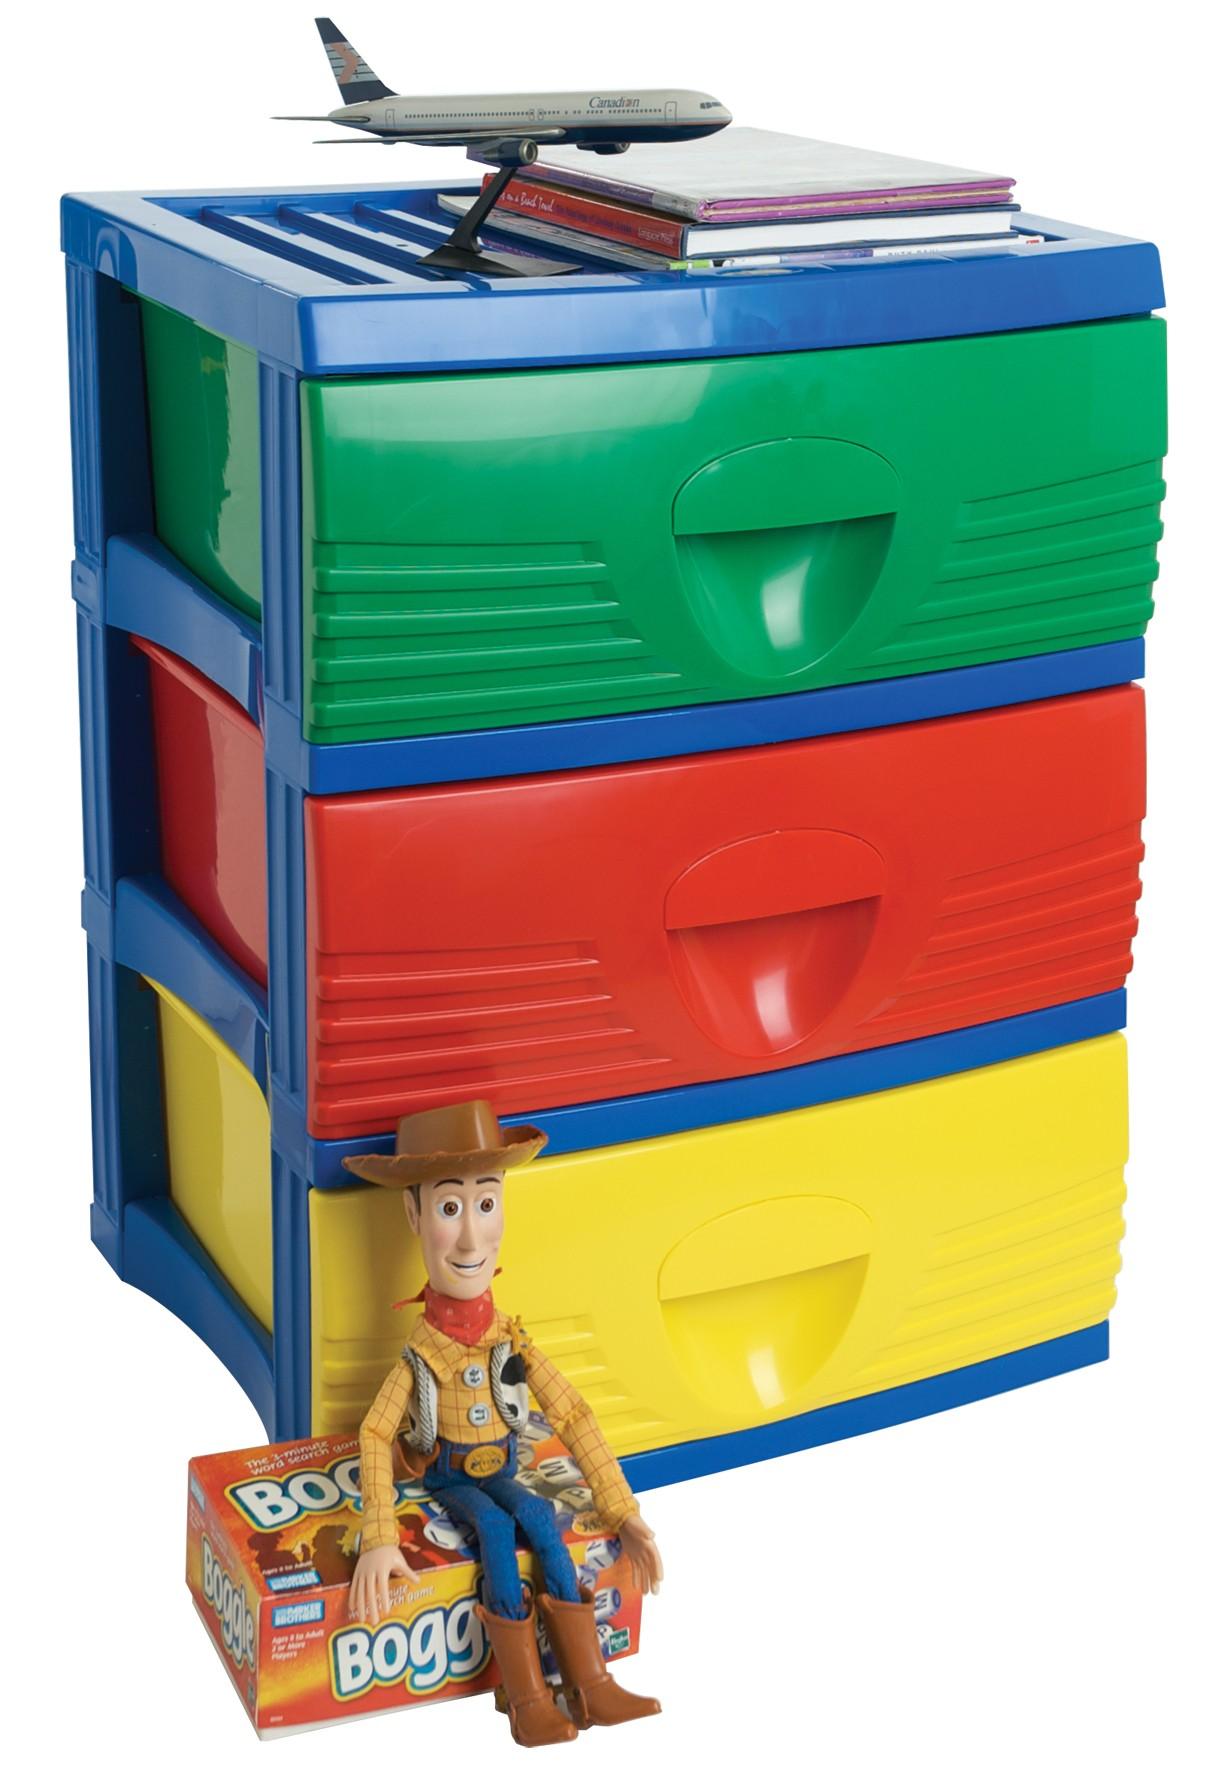 sc 1 st  Storage Box & Plastic B2 Unit 3 Drawer Coloured from Storage Box